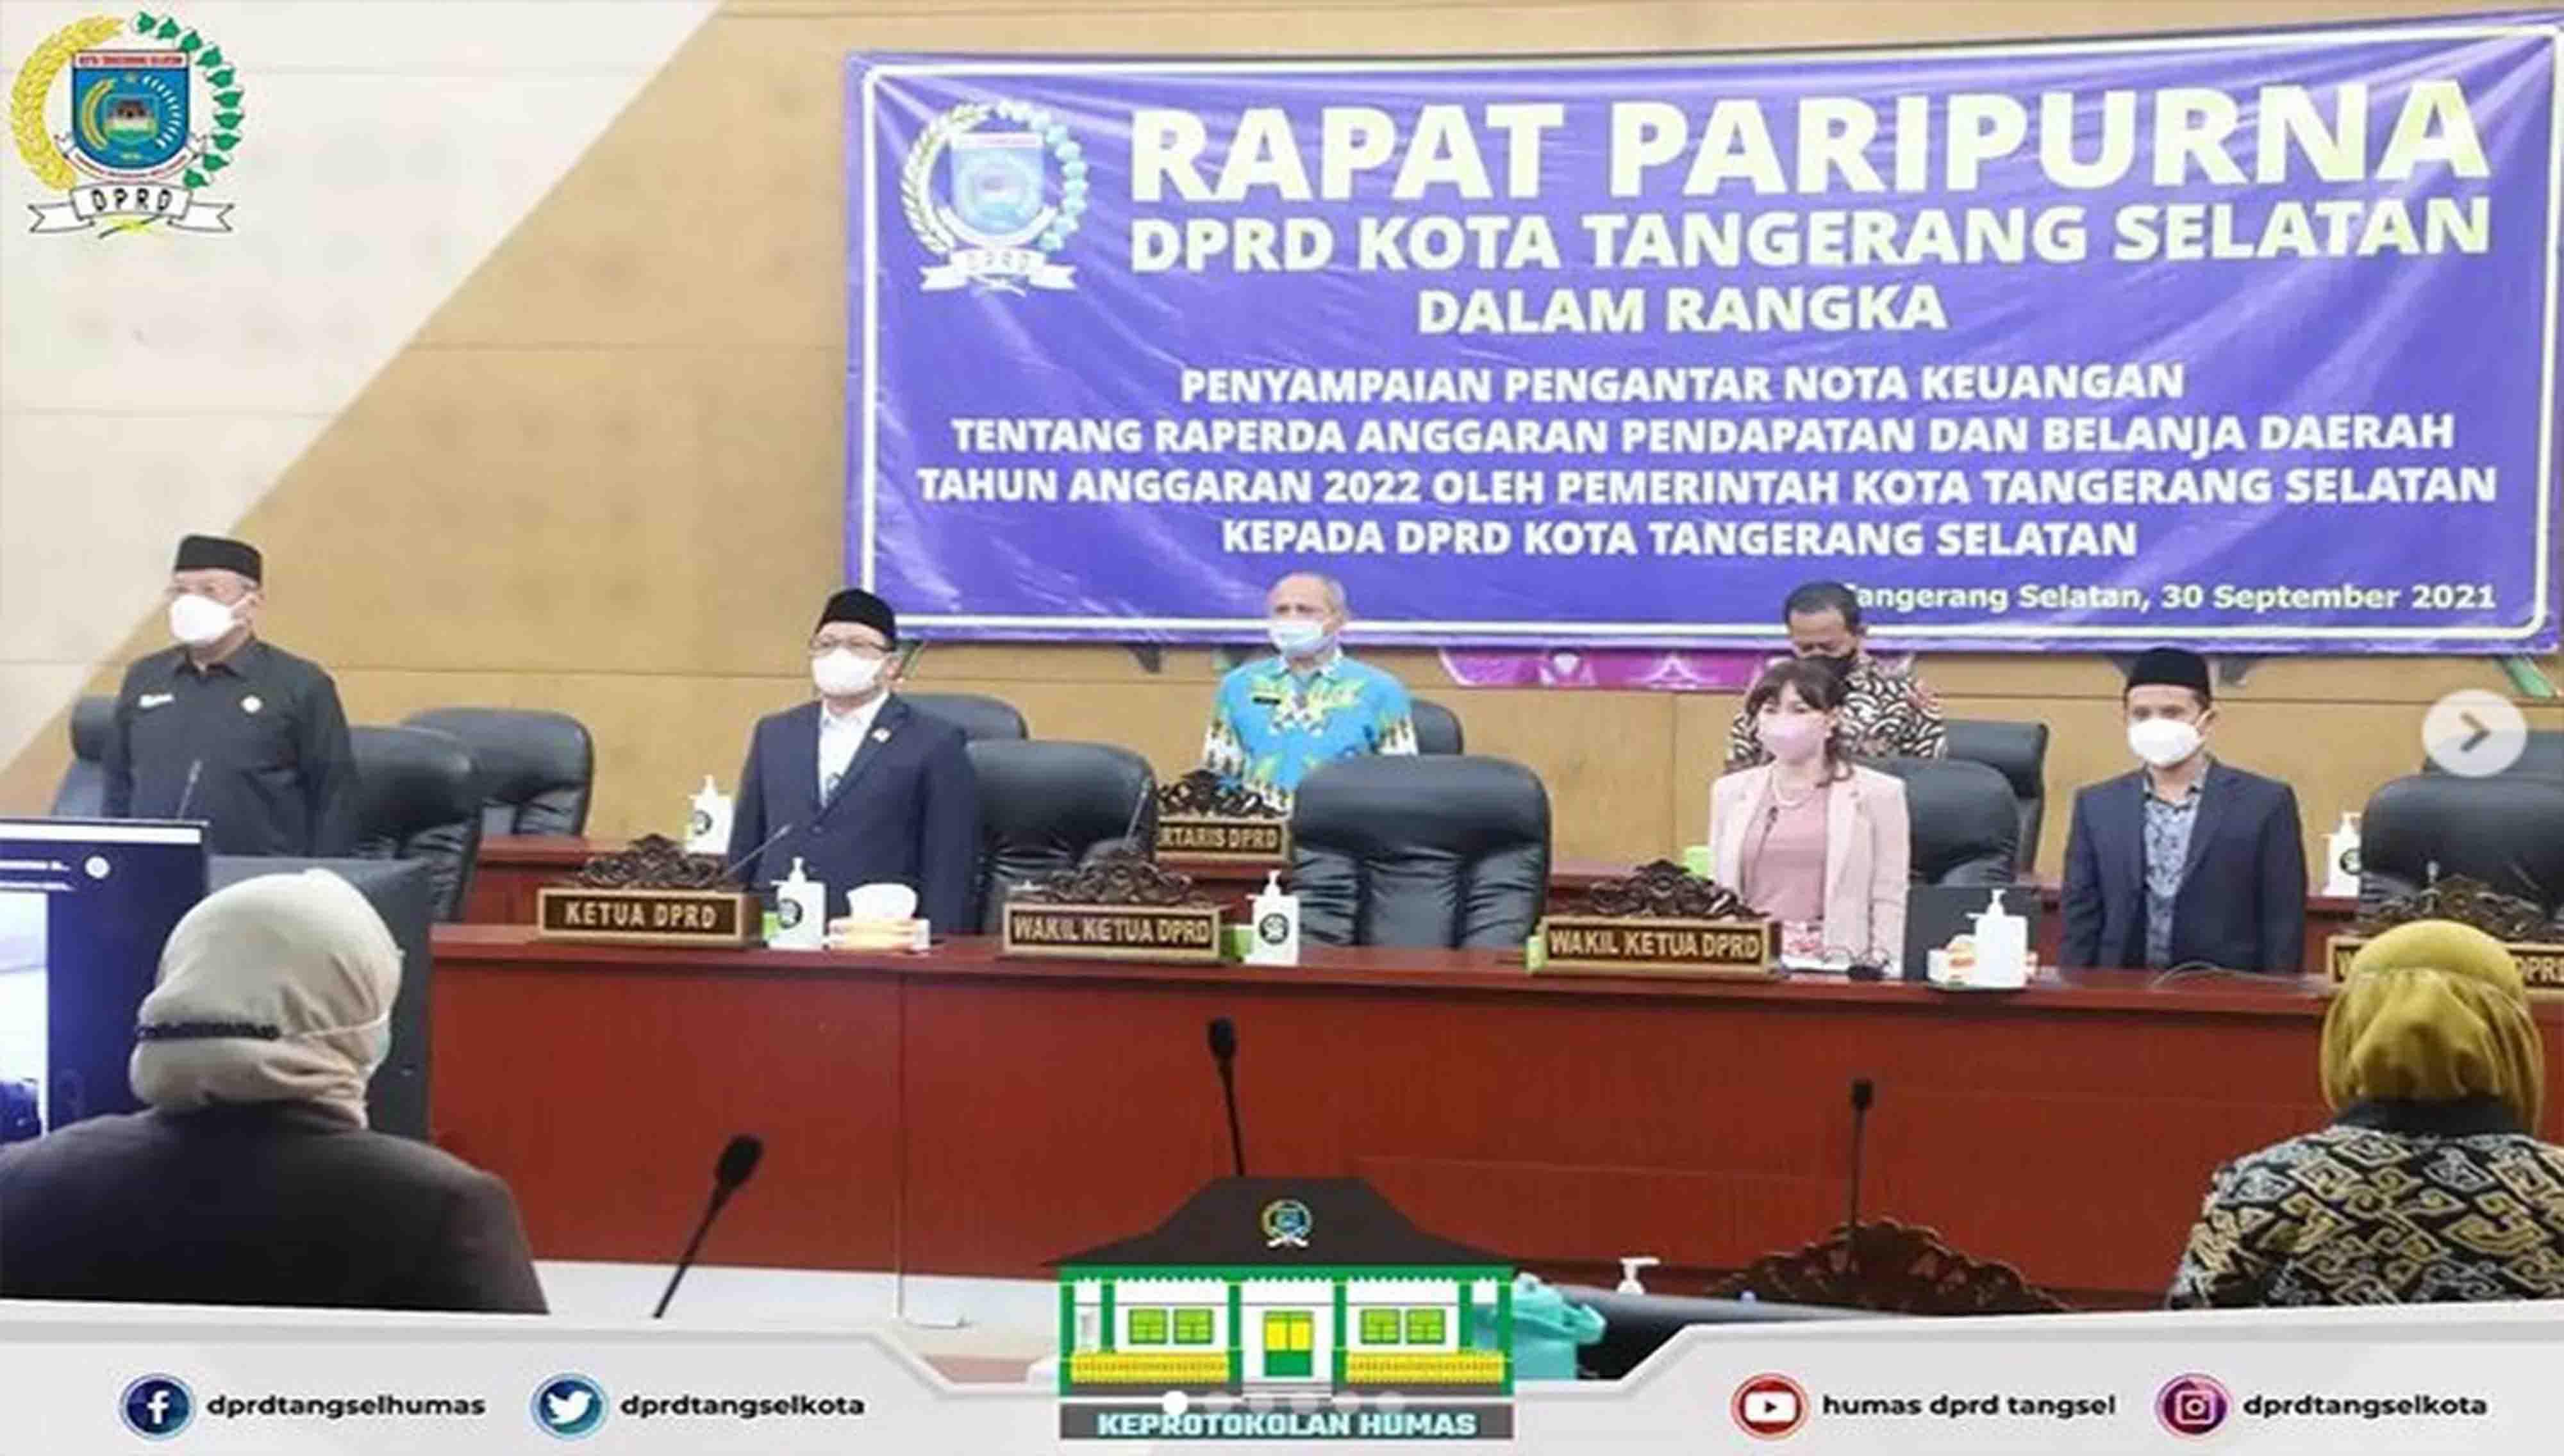 DPRD Kota Tangerang Selatan menggelar 2 (dua) Agenda Rapat Paripurna